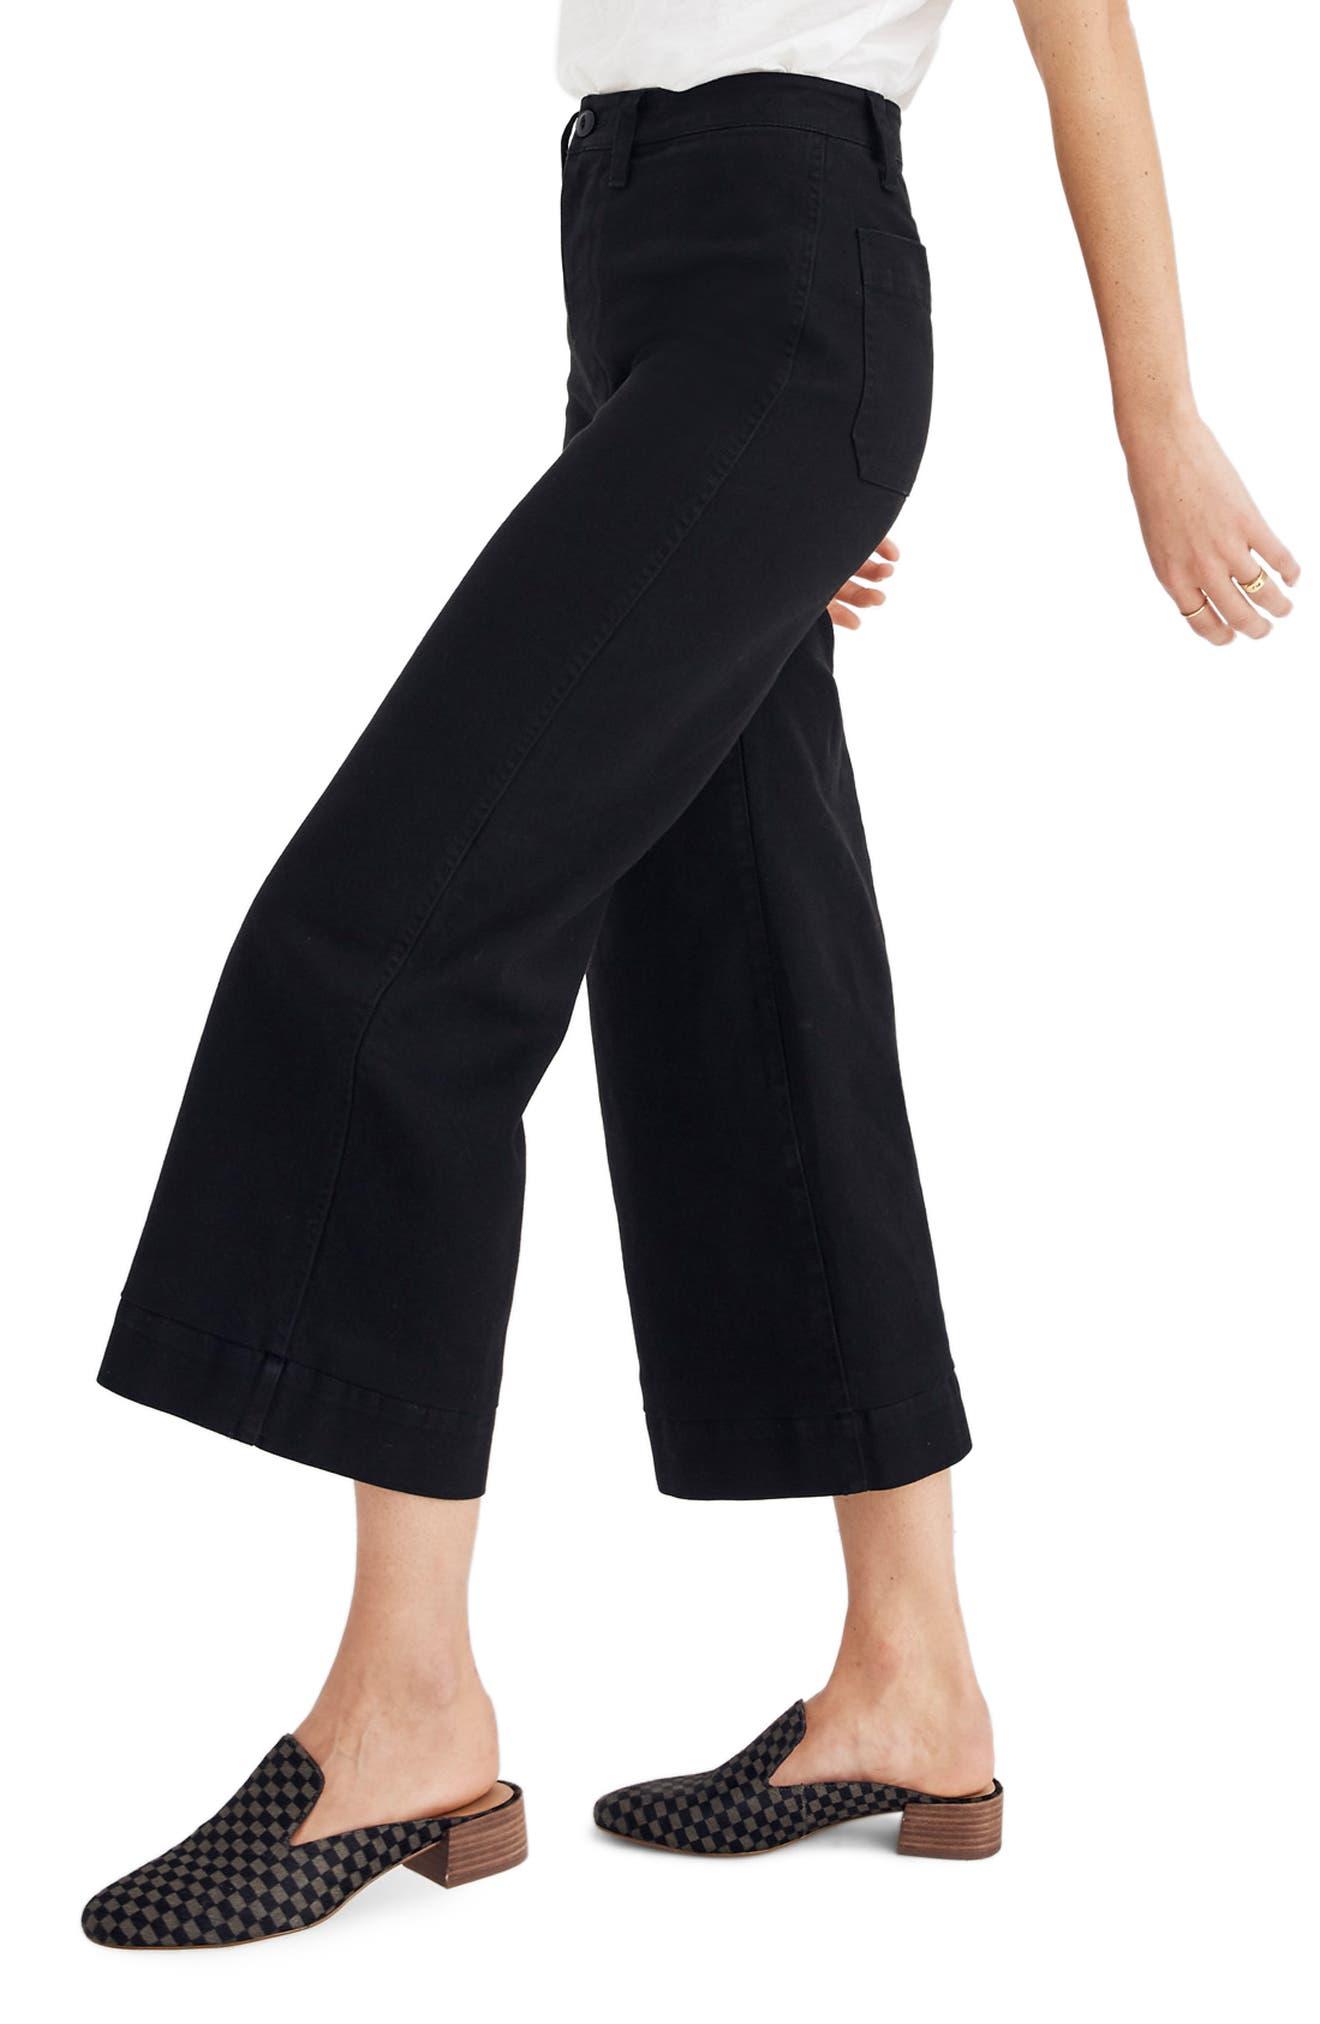 MADEWELL, Emmett Crop Wide Leg Pants, Alternate thumbnail 4, color, CLASSIC BLACK